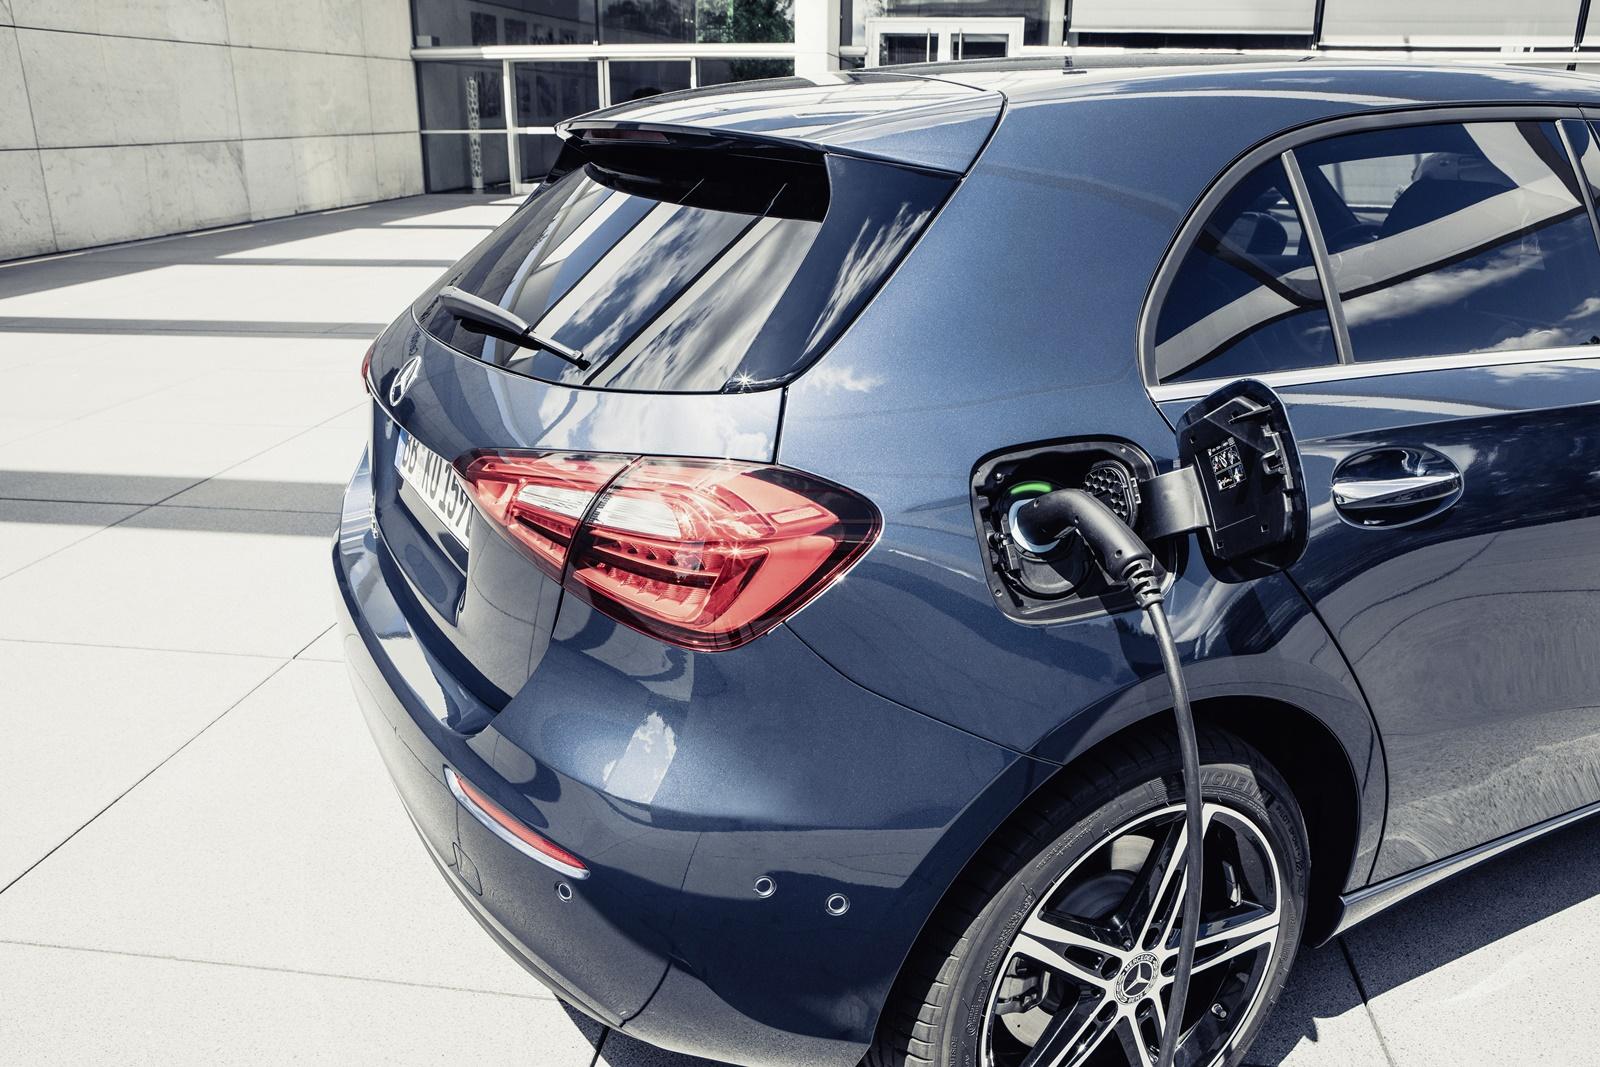 Mercedes-Benz A-Klasse Plug-in-Hybrid // Mercedes-Benz A-Class Plug-in-Hybrid